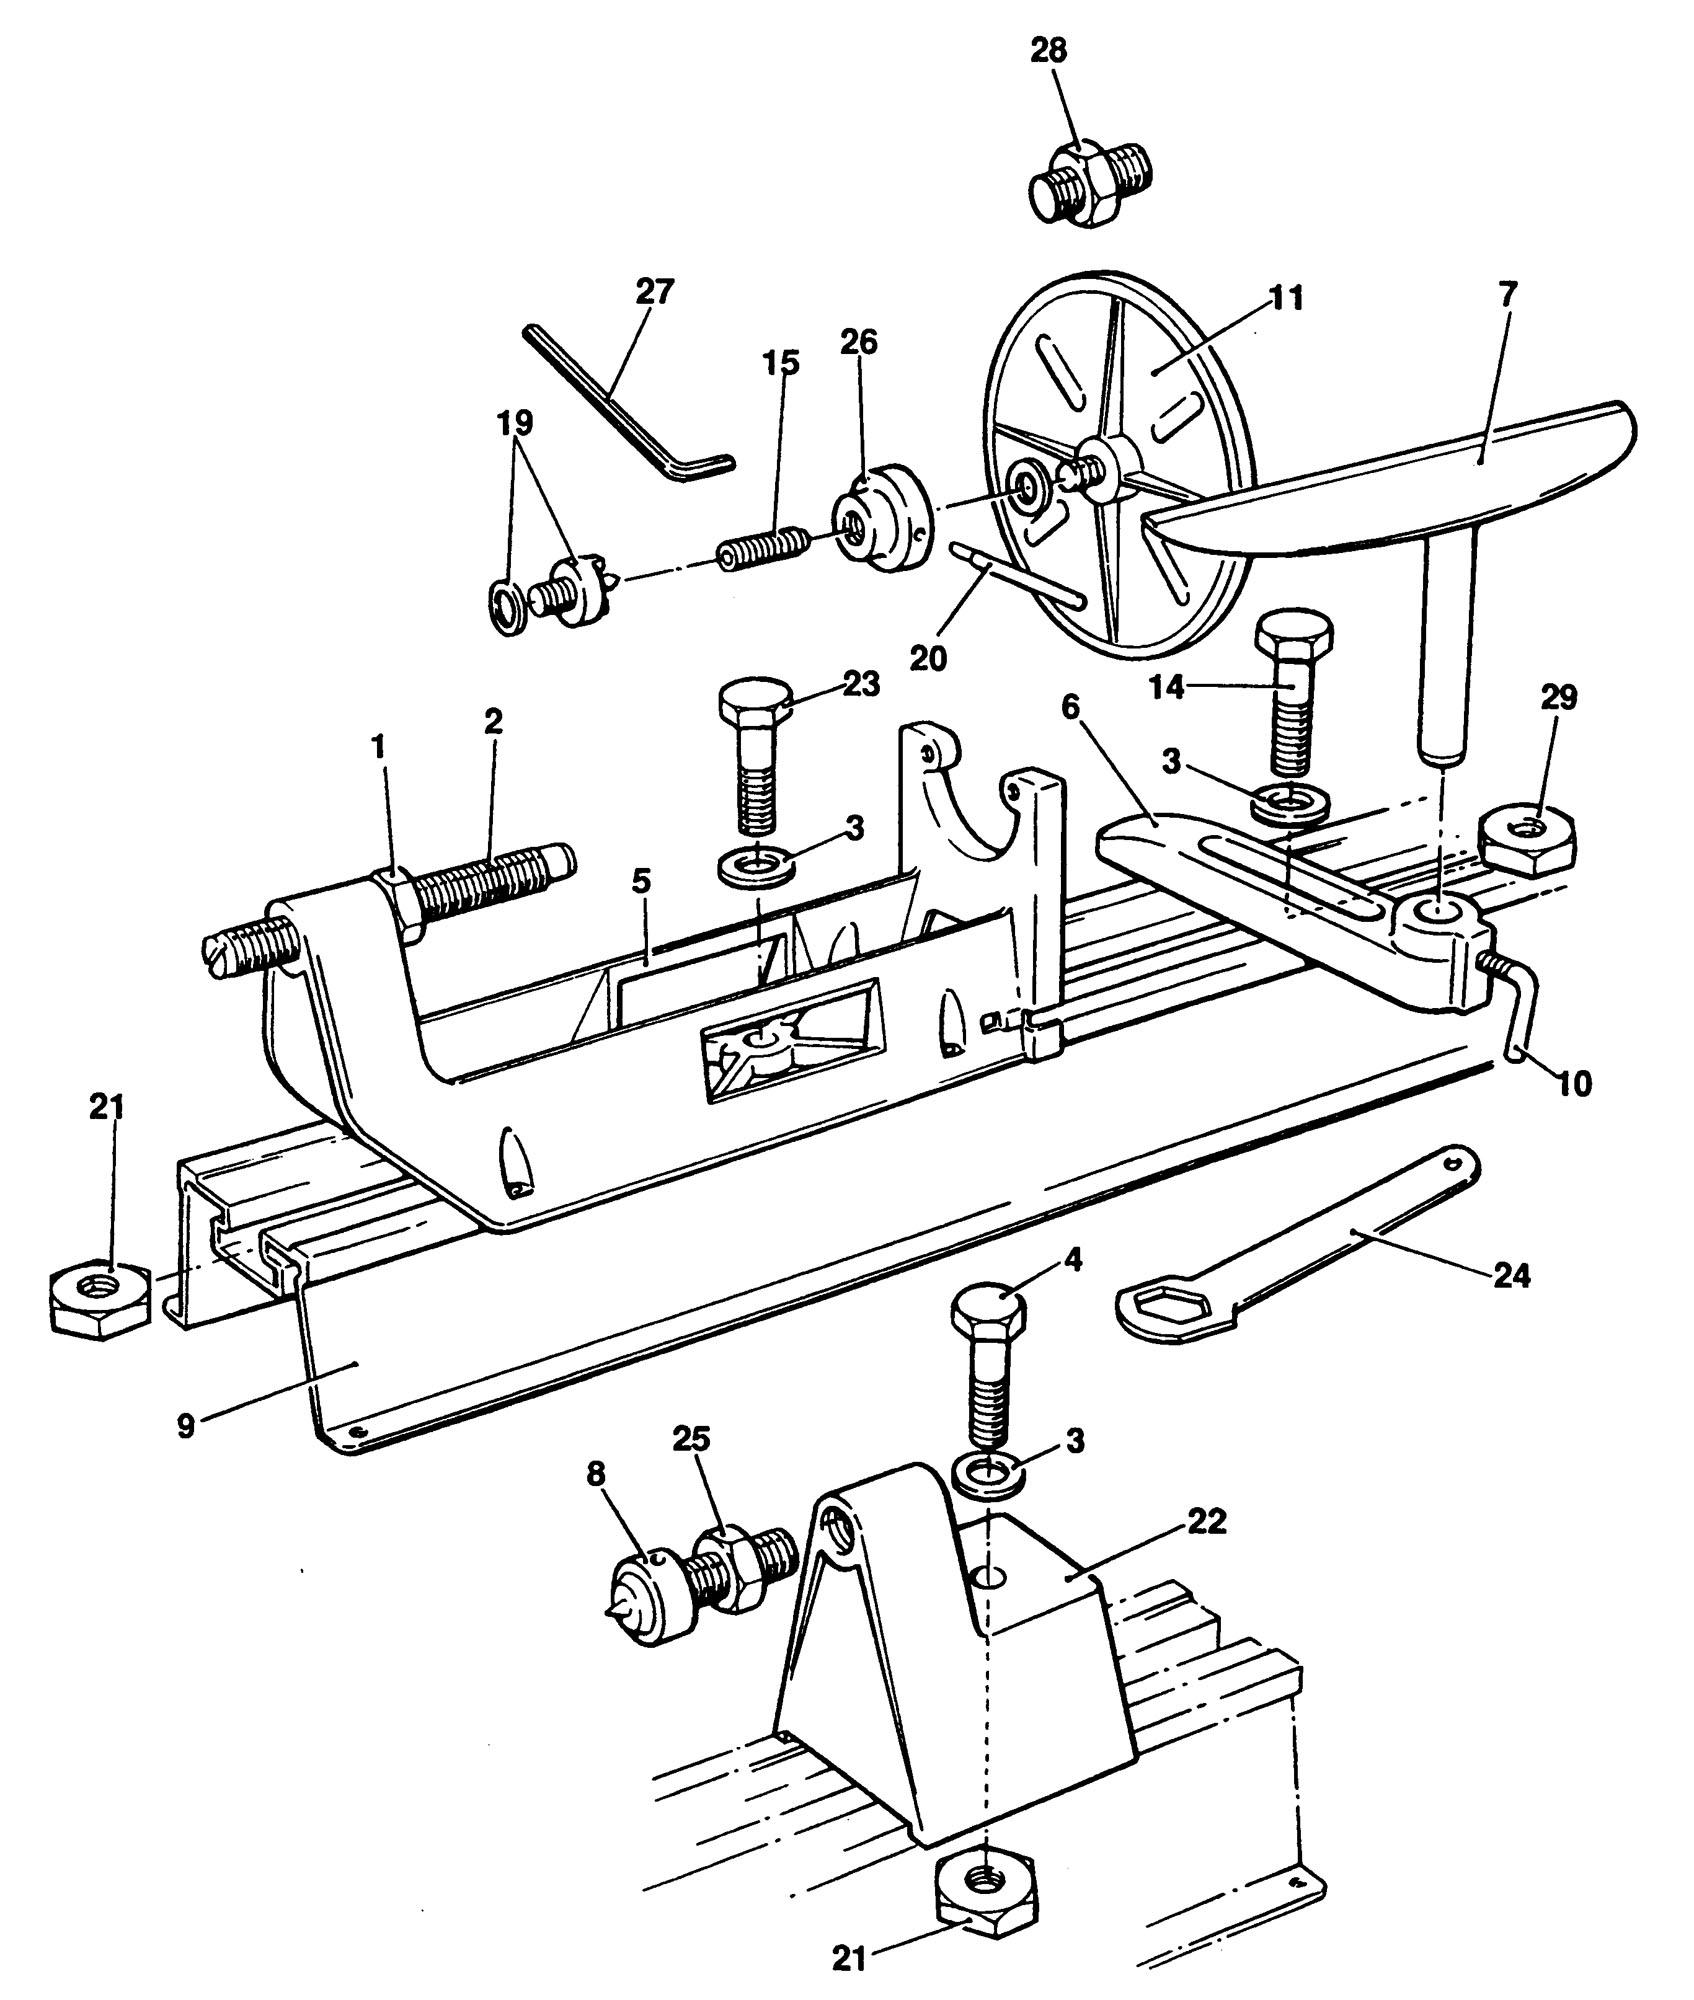 Spares For Black Amp Decker D994 Lathe Type 1 Spare D994